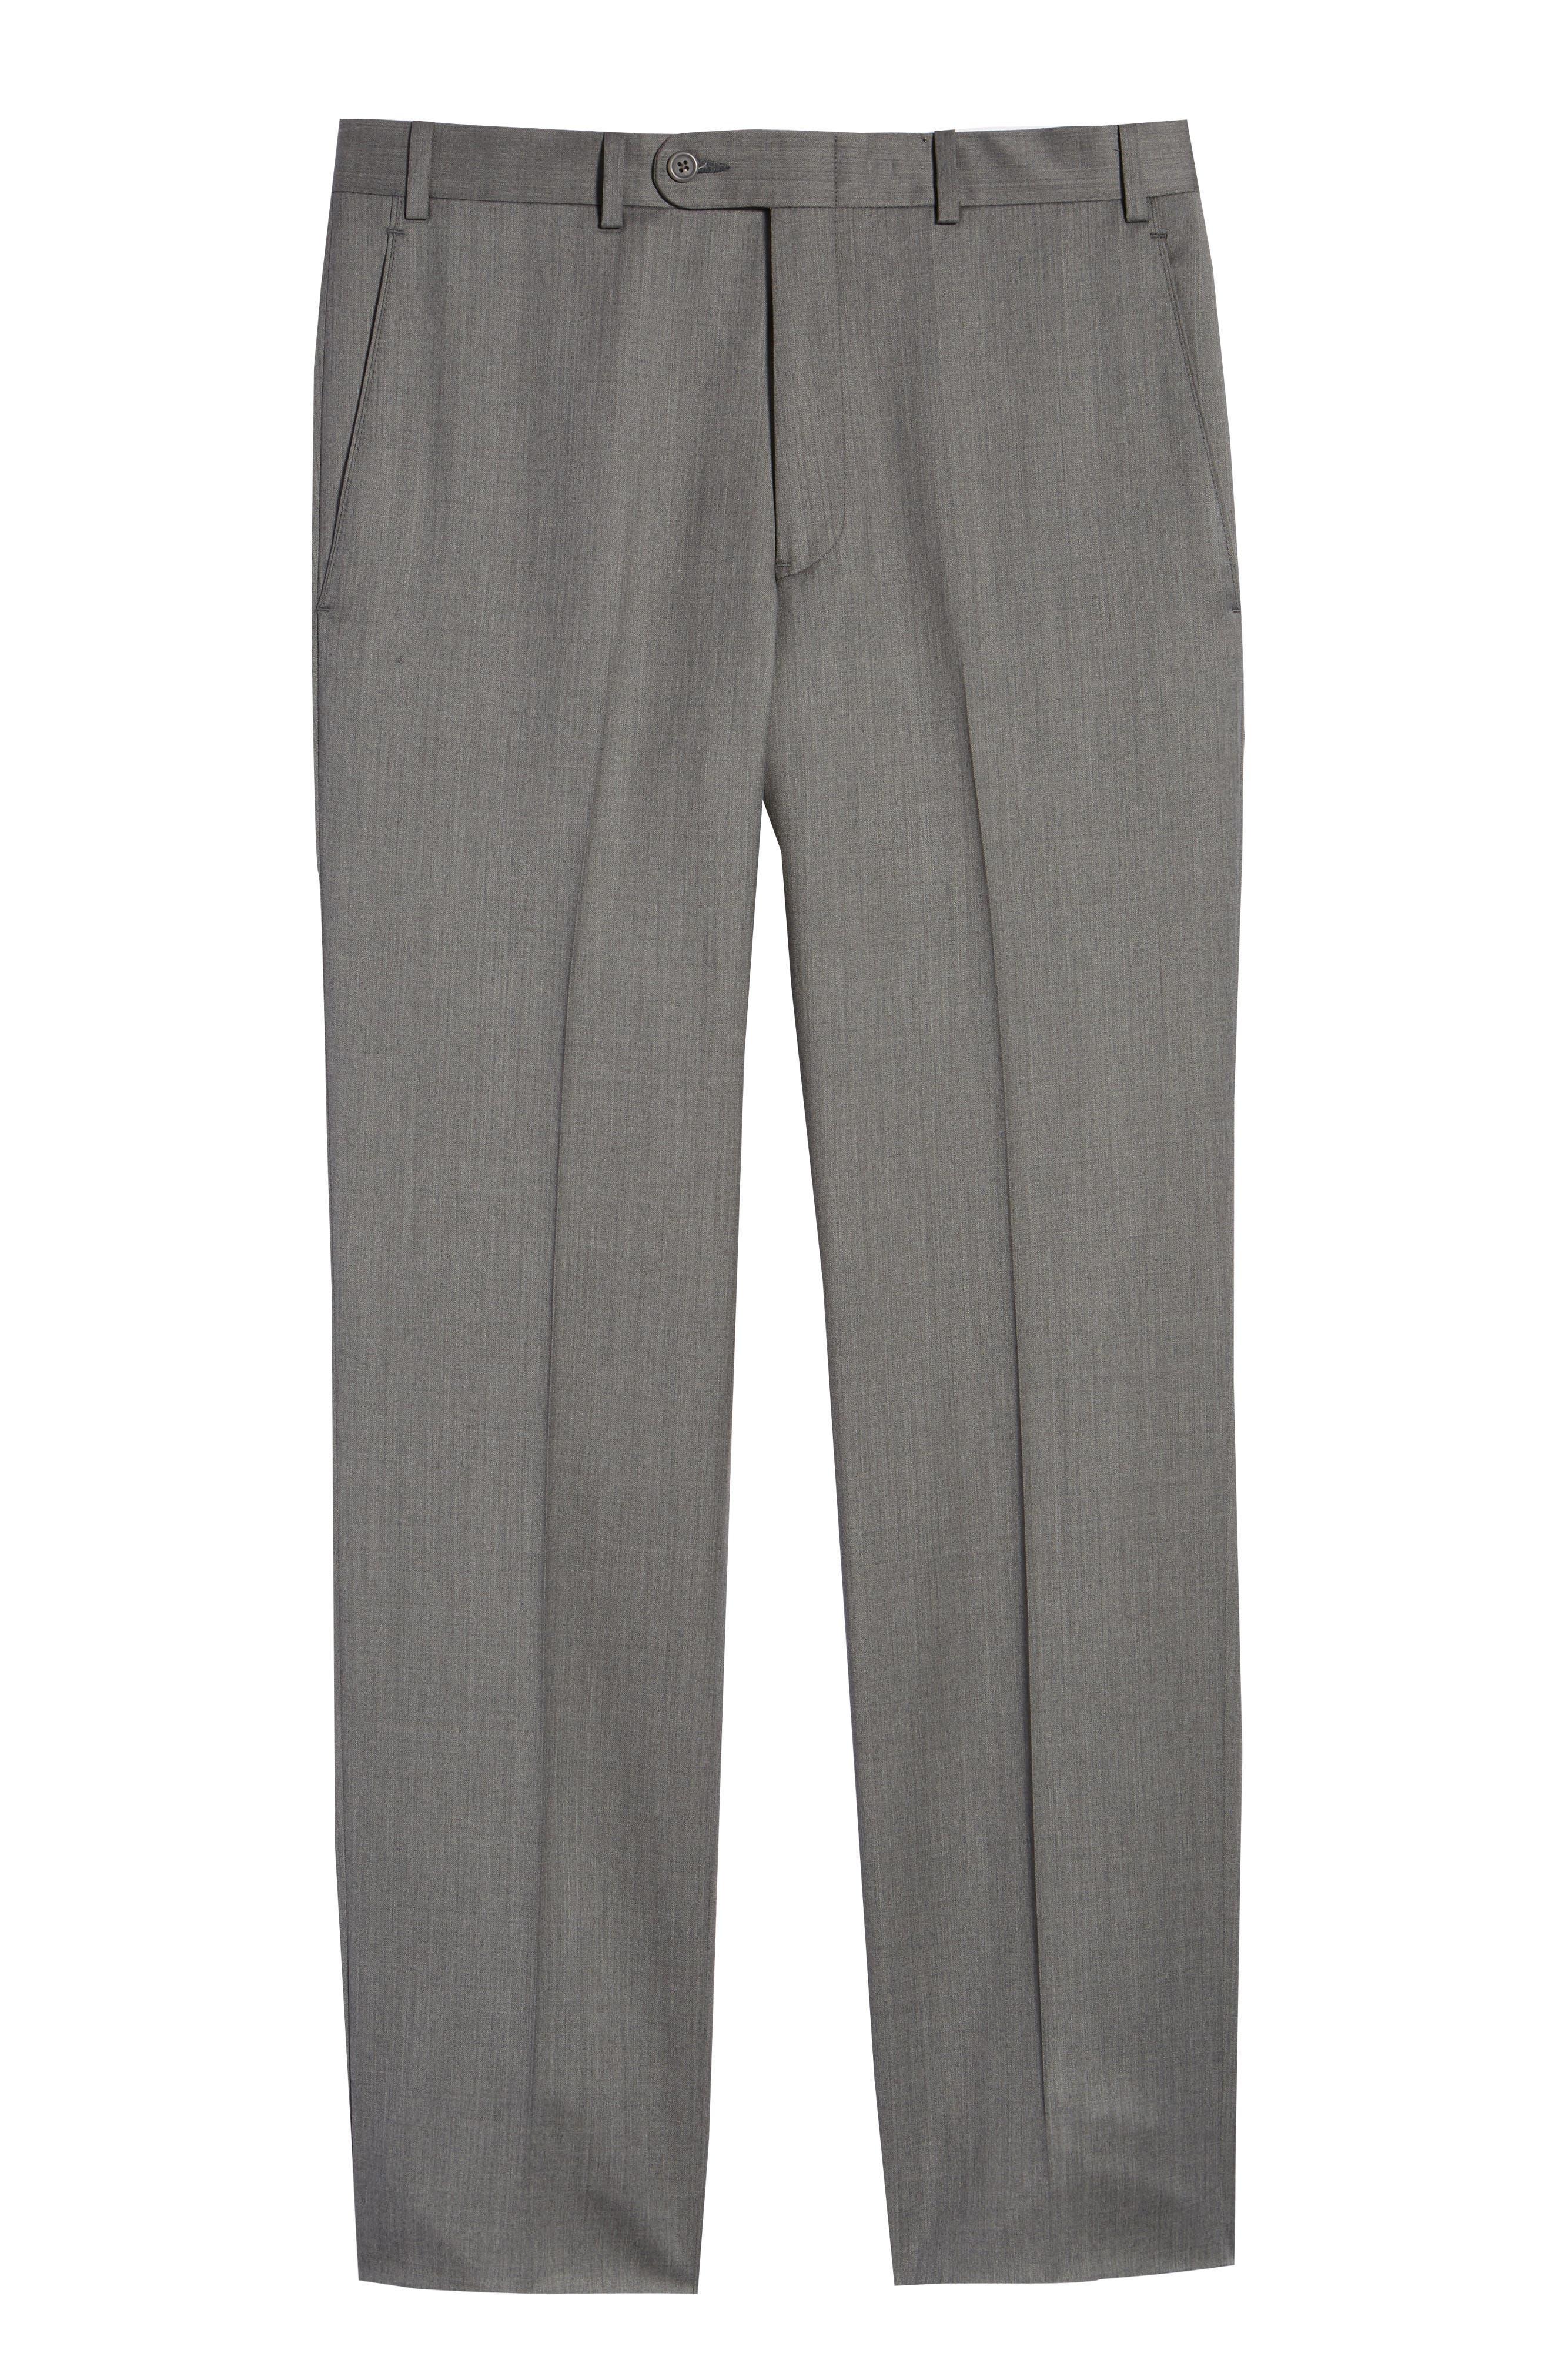 Torino Flat Front Wool Gabardine Trousers,                             Alternate thumbnail 33, color,